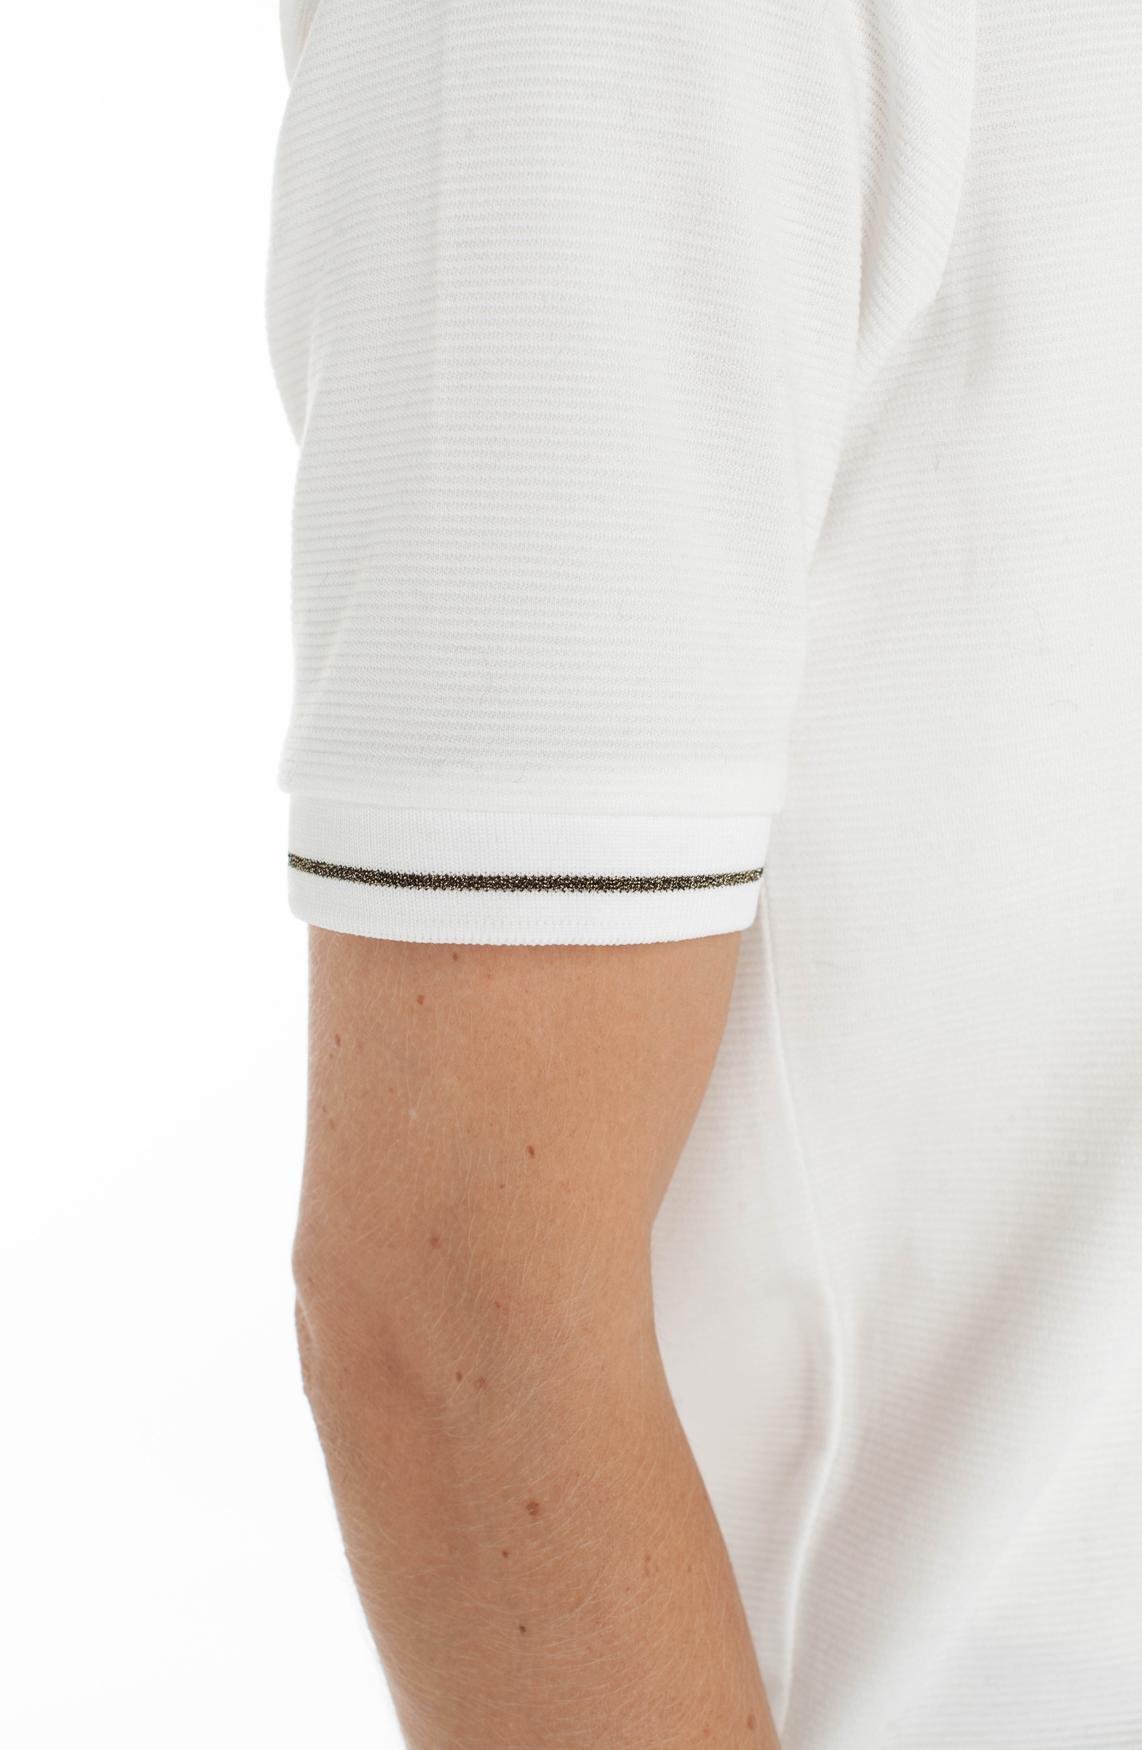 Anna Blue Dames Shirt met ribpatroon wit